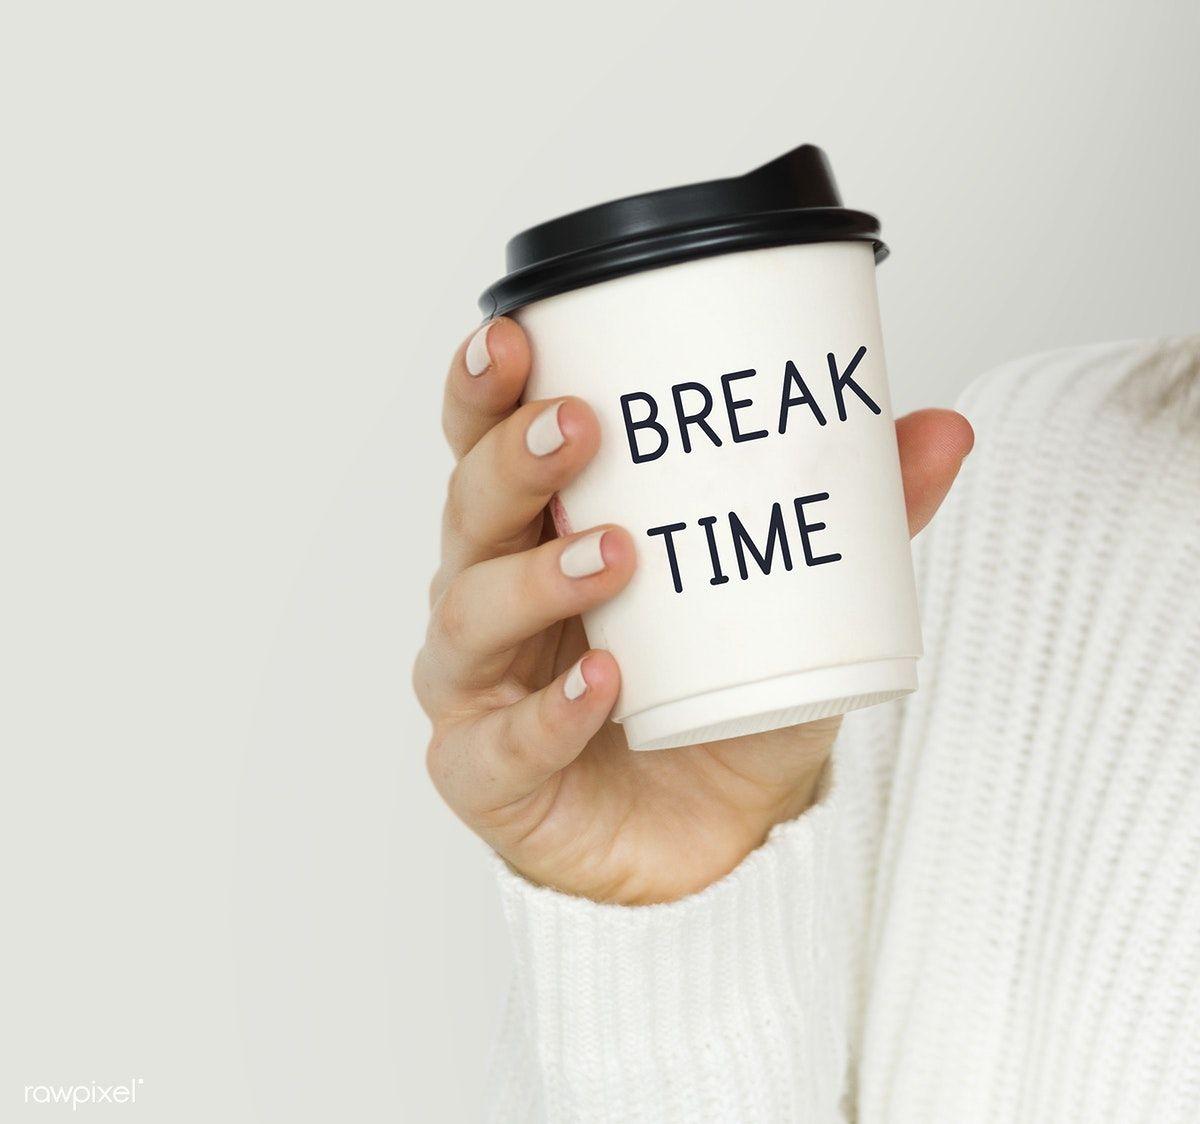 Download premium photo of Break time 202315